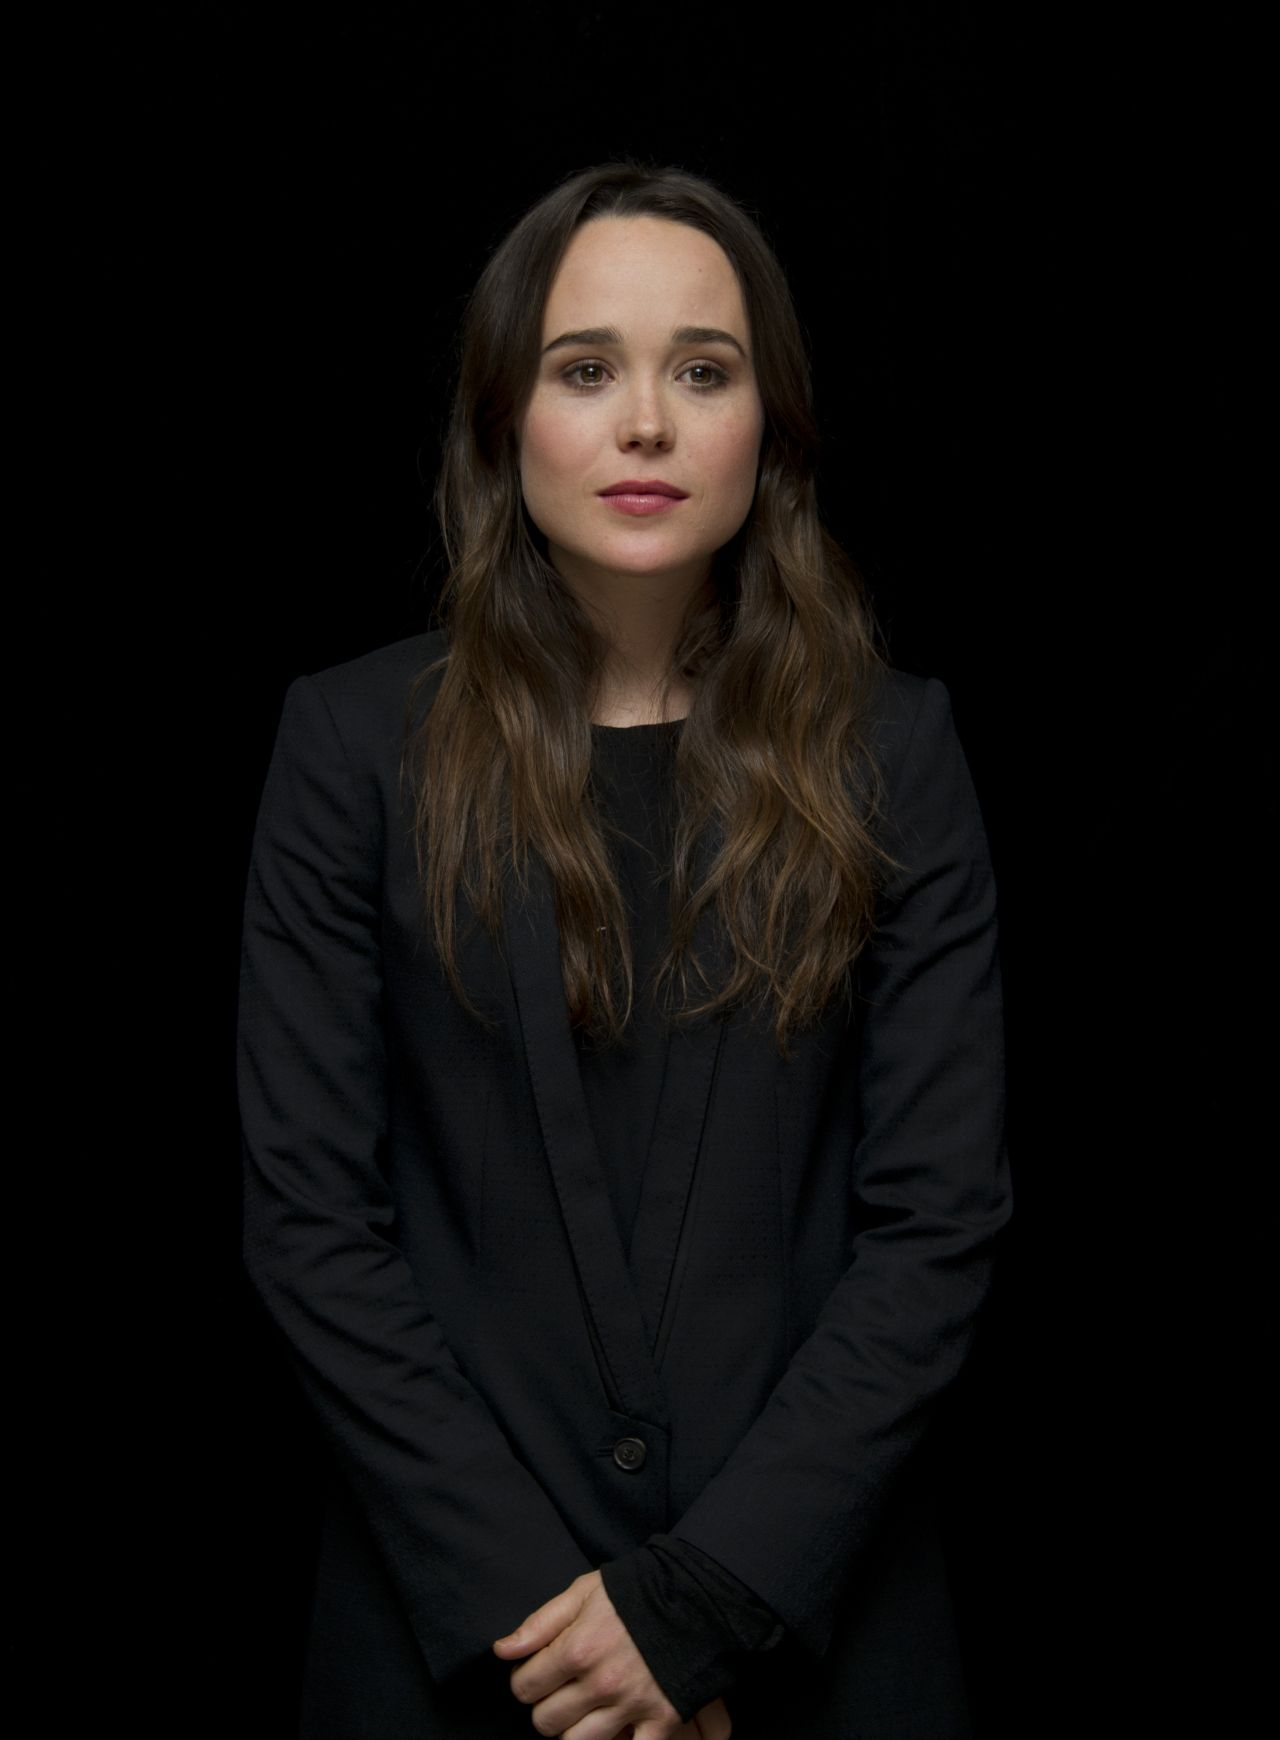 X-MEN: DAYS OF FUTURE PAST Press Conference - Ellen Page